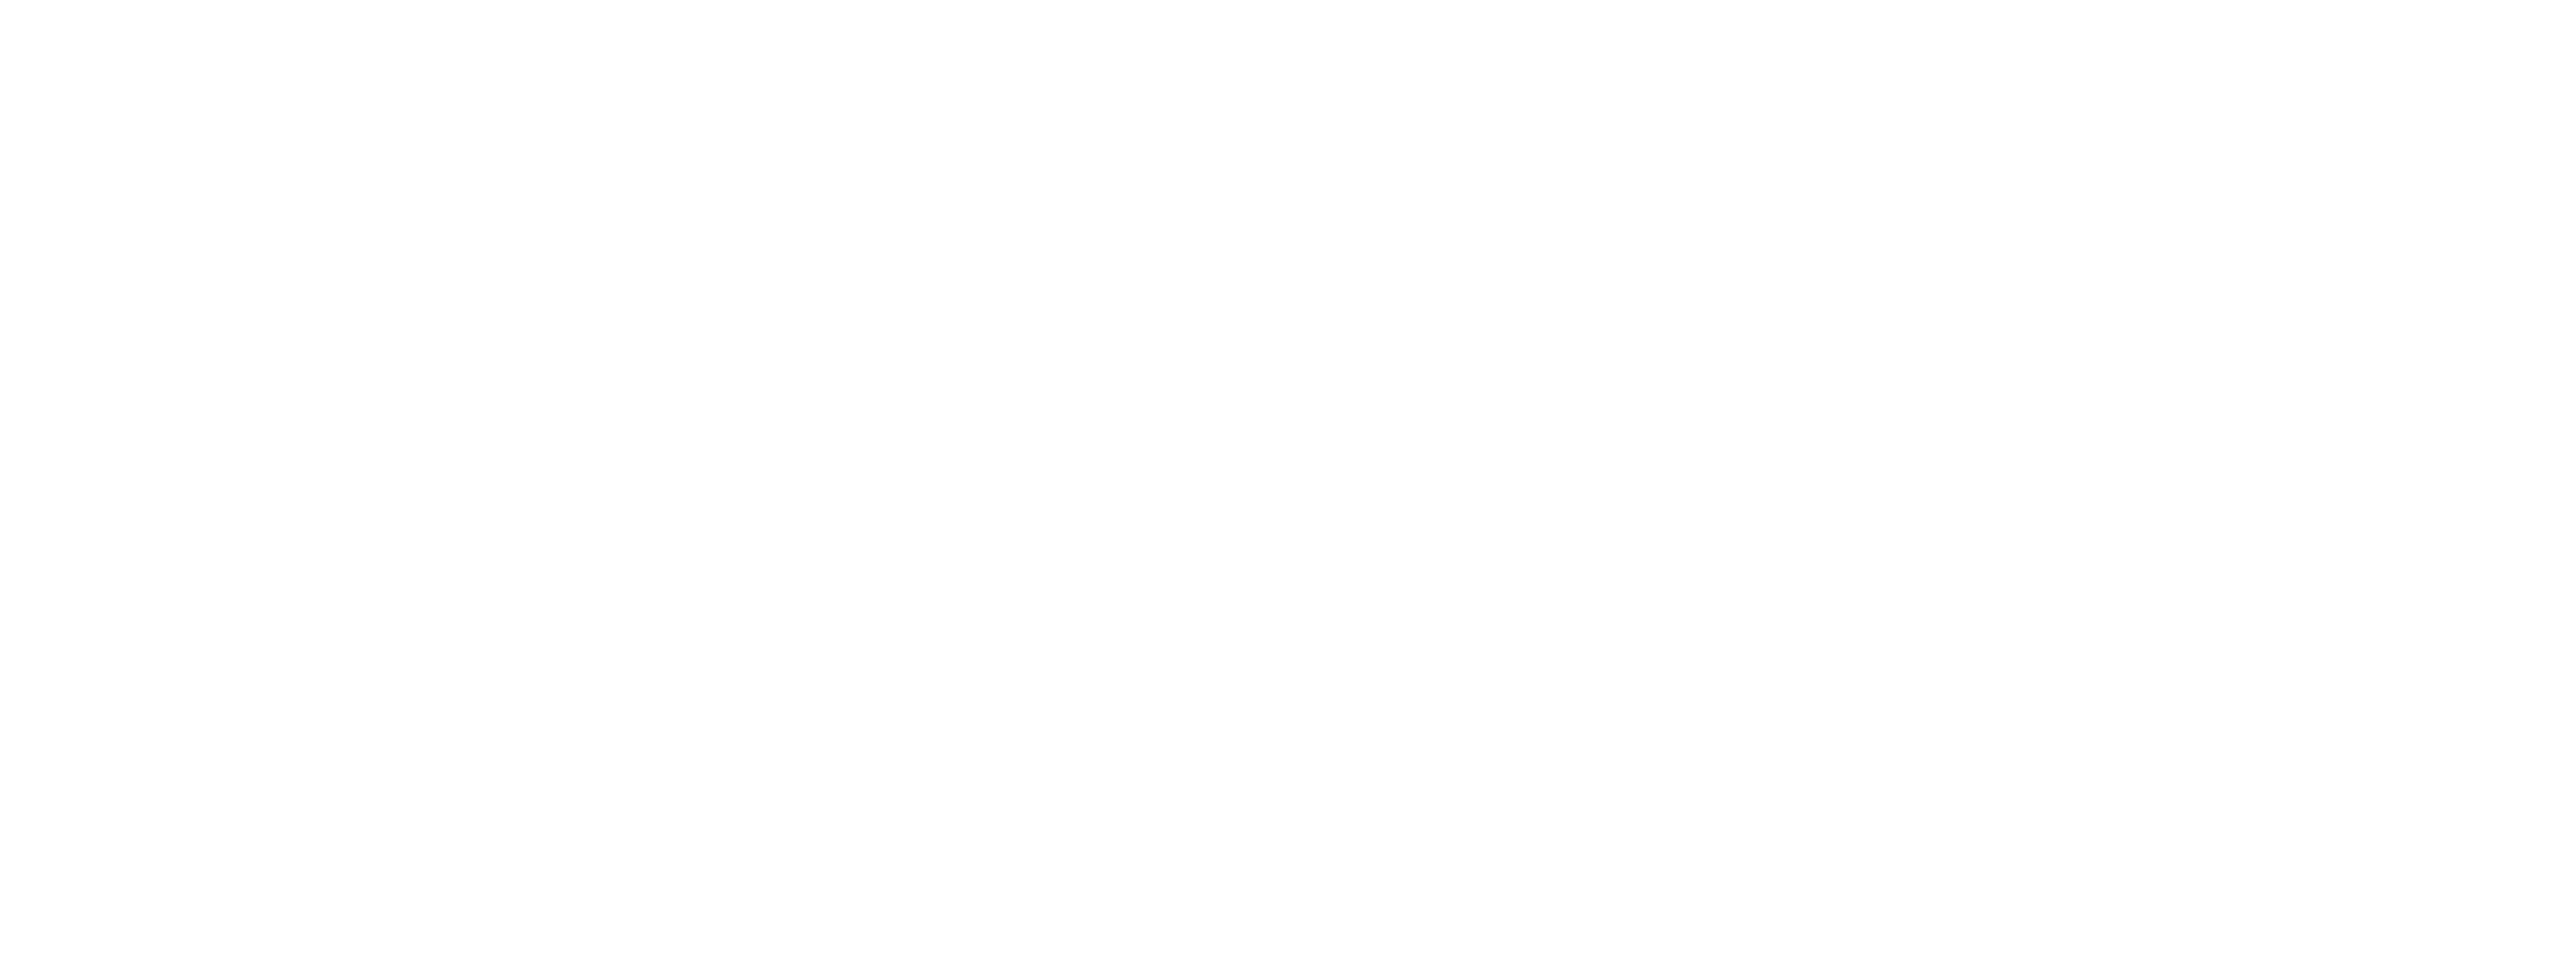 New Startup business needs an eyecatching yet professional logo!